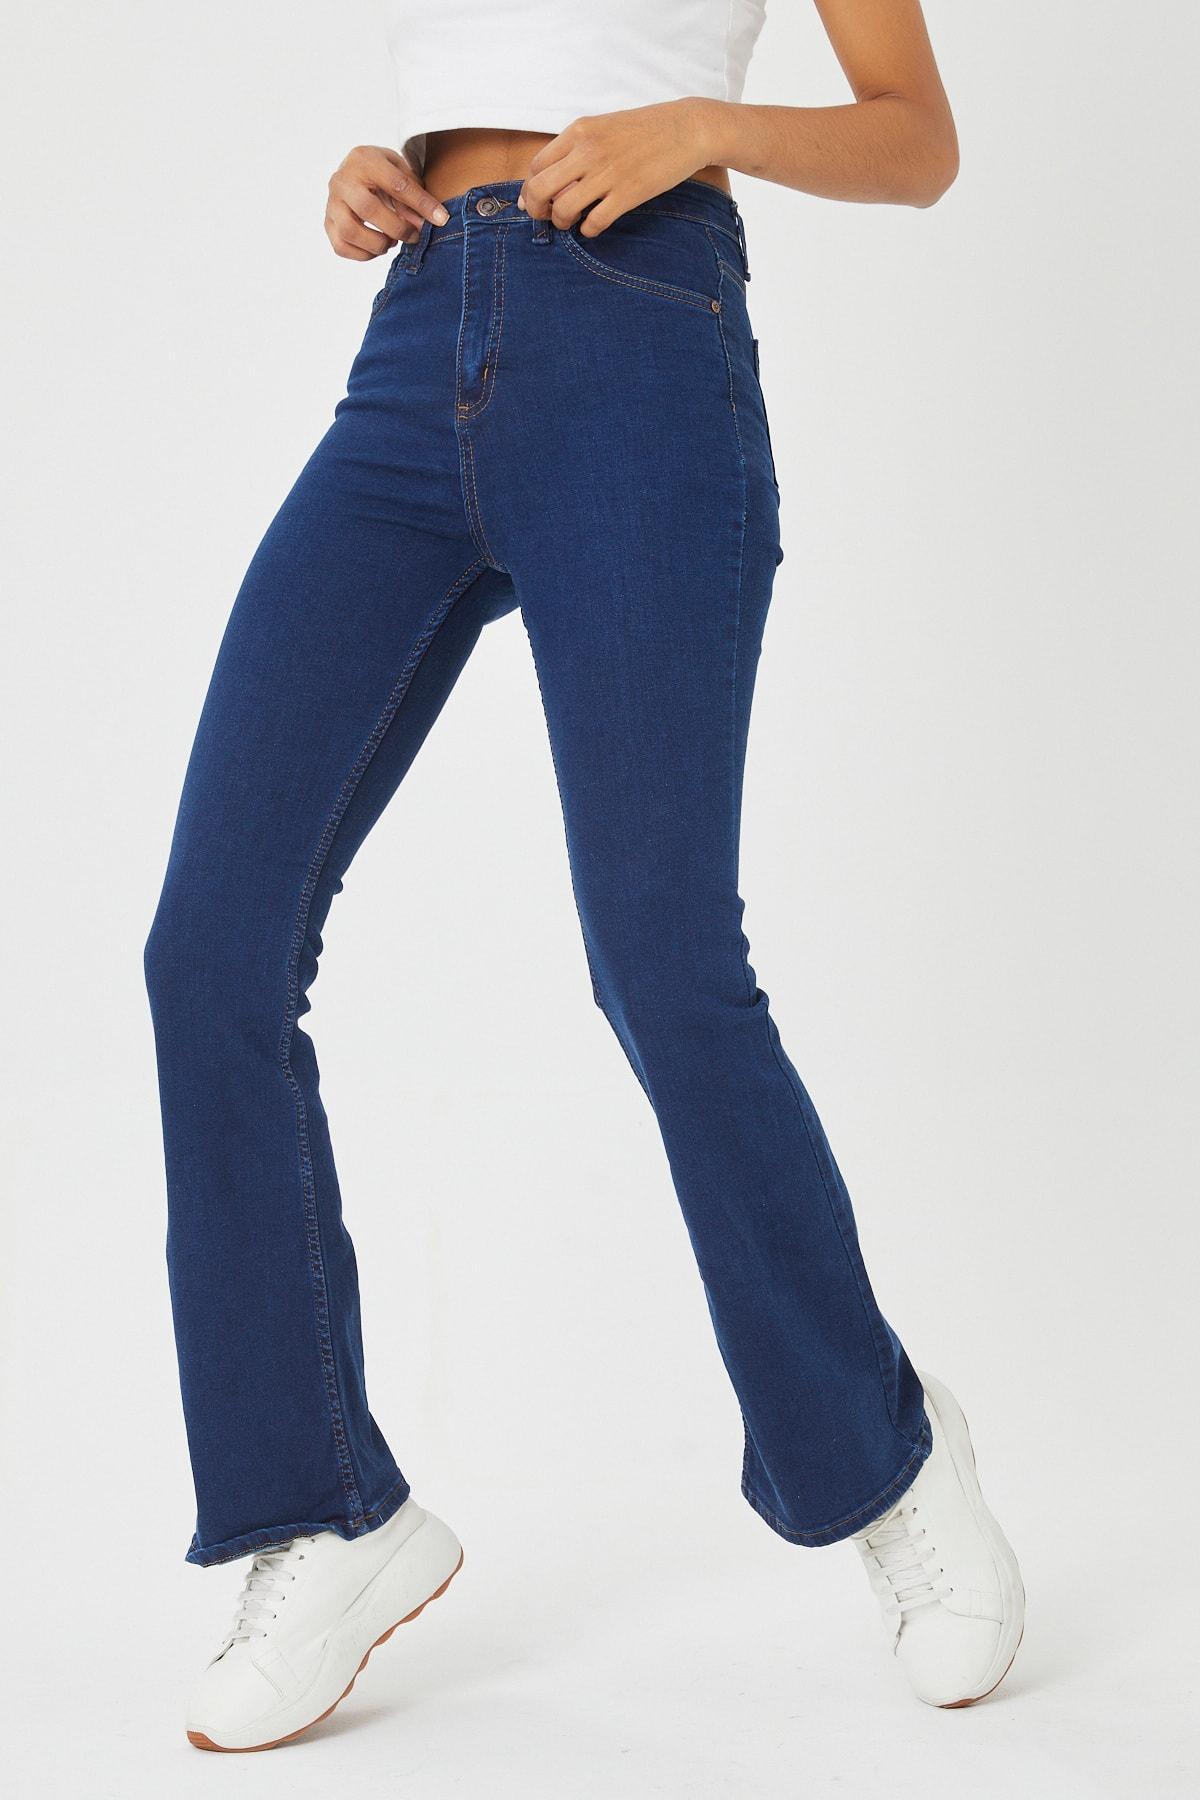 VAV Kadın Mavi İspanyol Paça Kot Pantolon 2